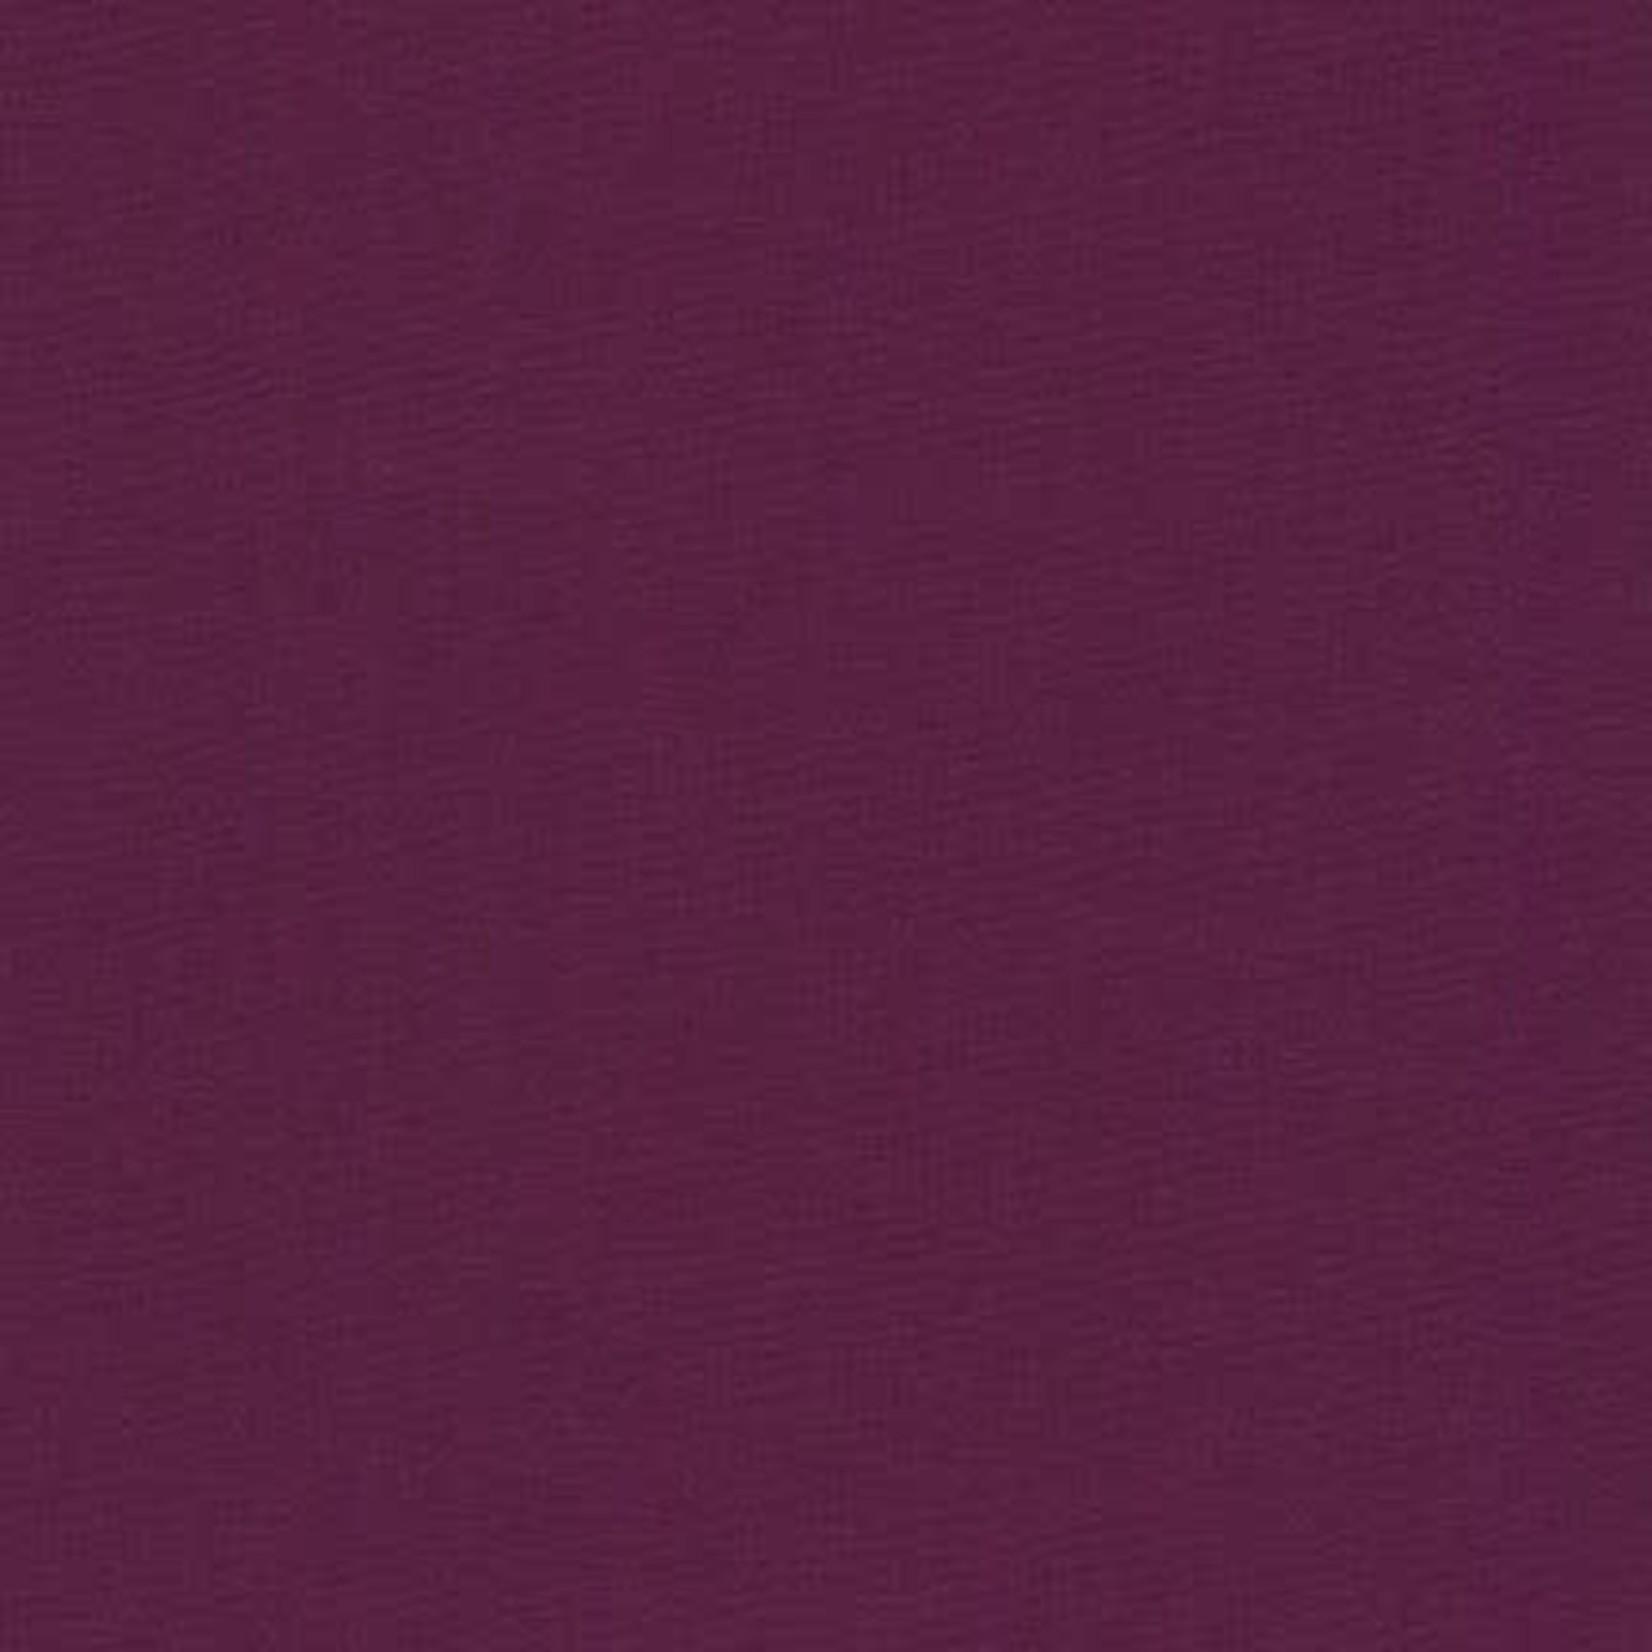 Kona KONA  K001-1133 EGGPLANT, PER CM OR $14/M